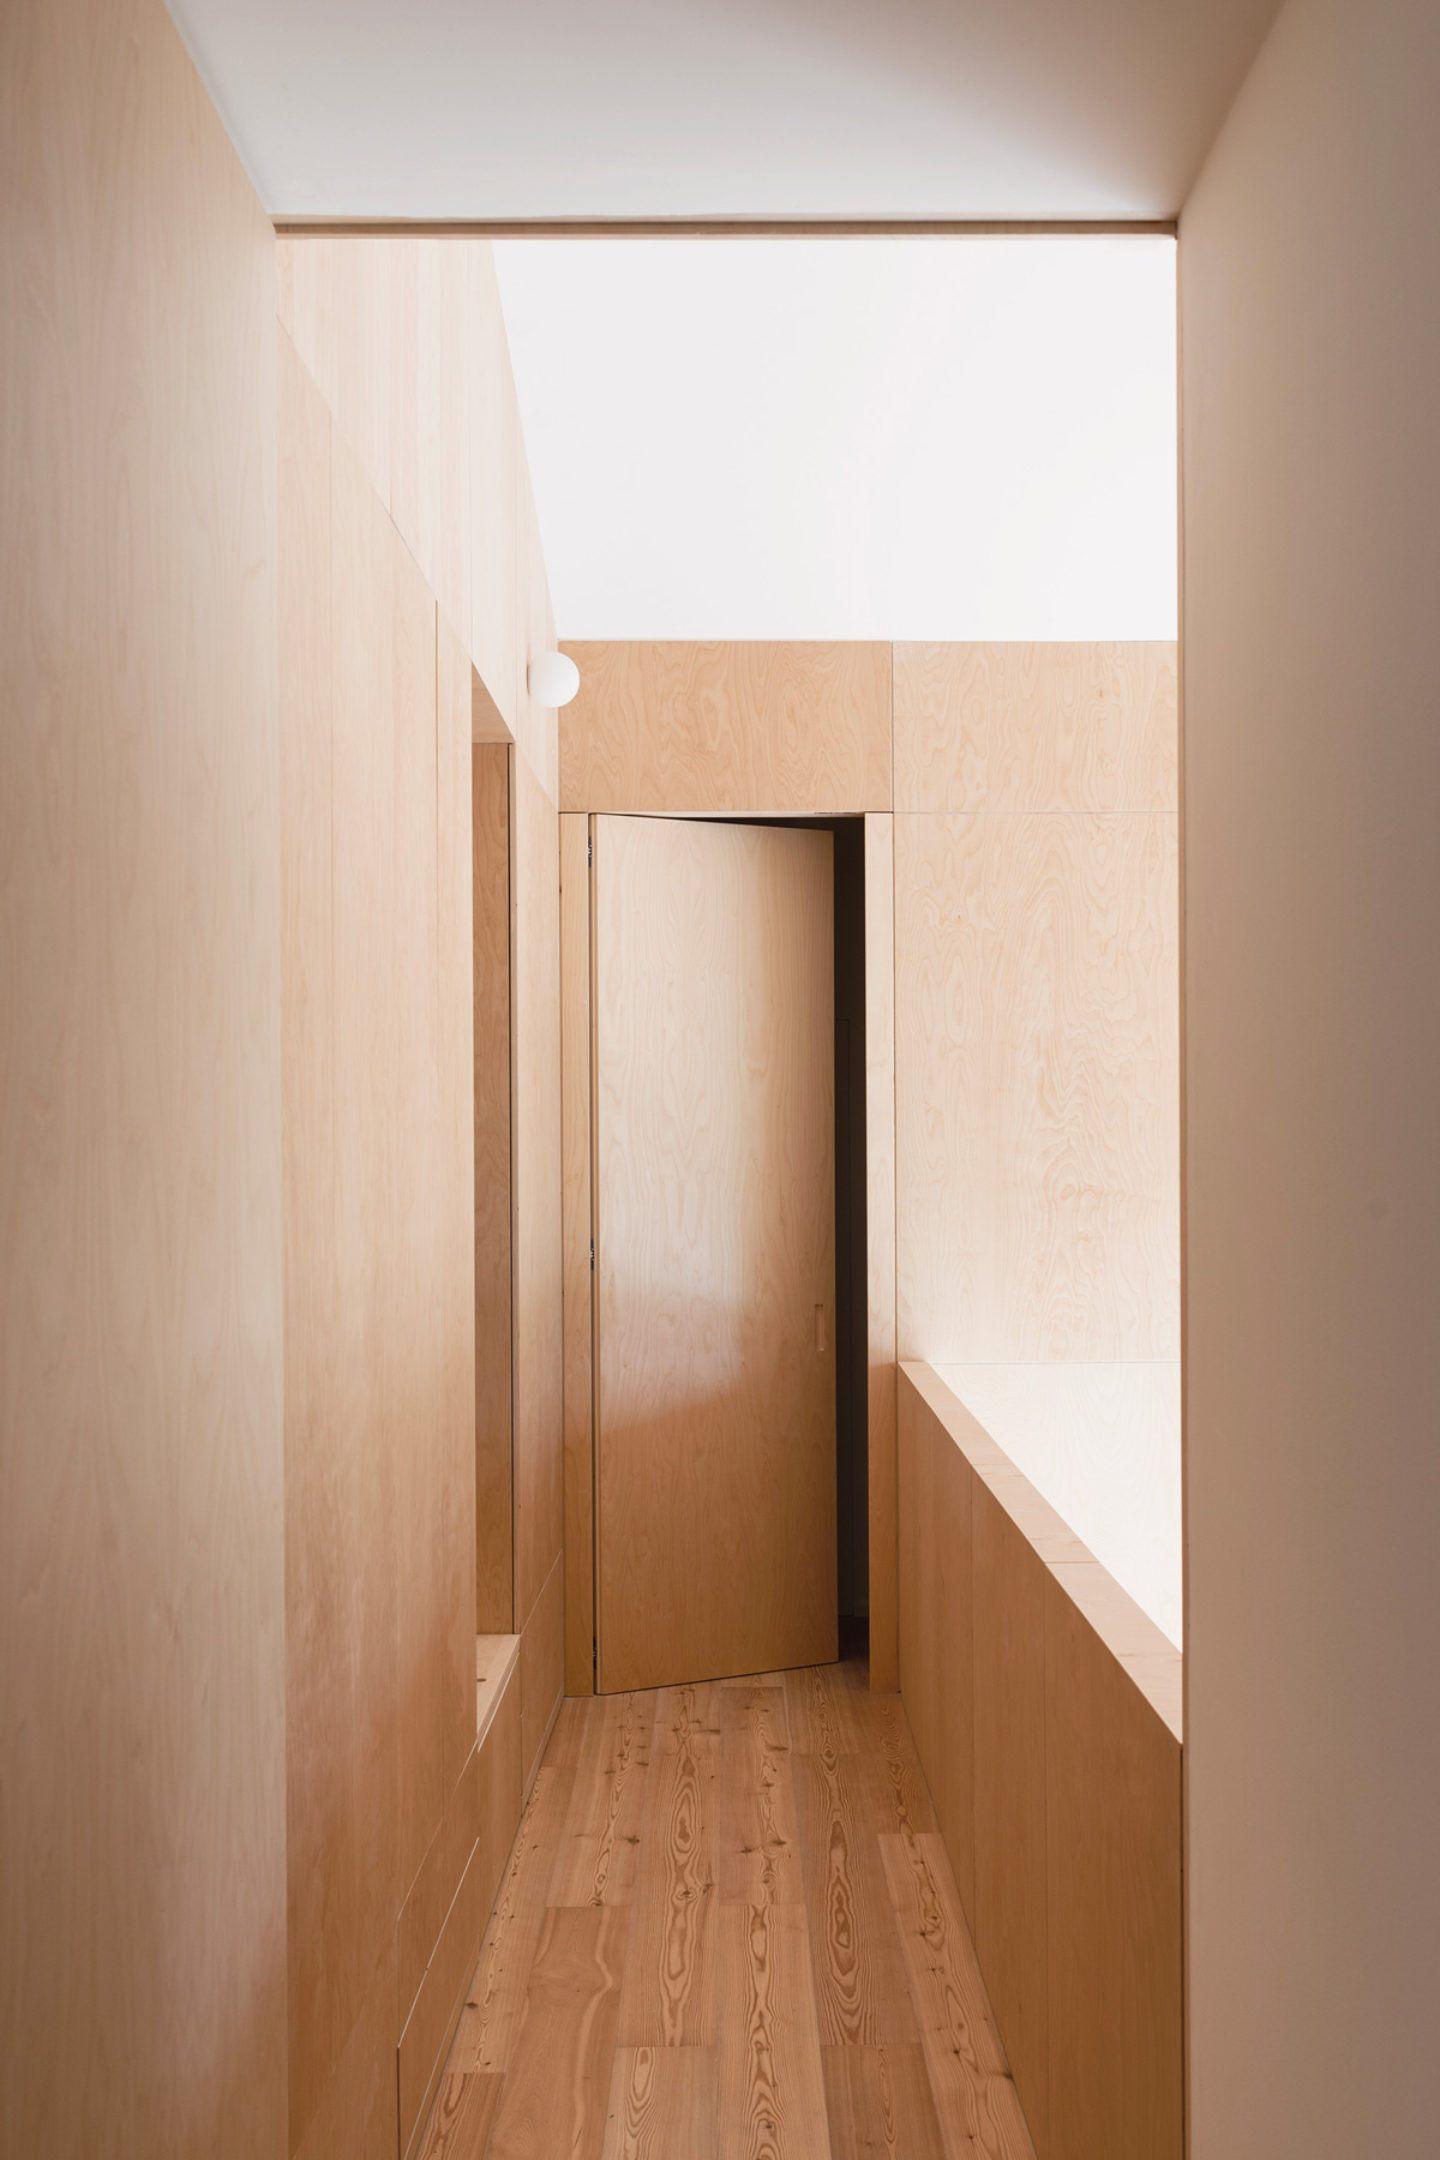 IGNANT-Architecture-Studio-Wok-Country-Home-In-Chievo-18